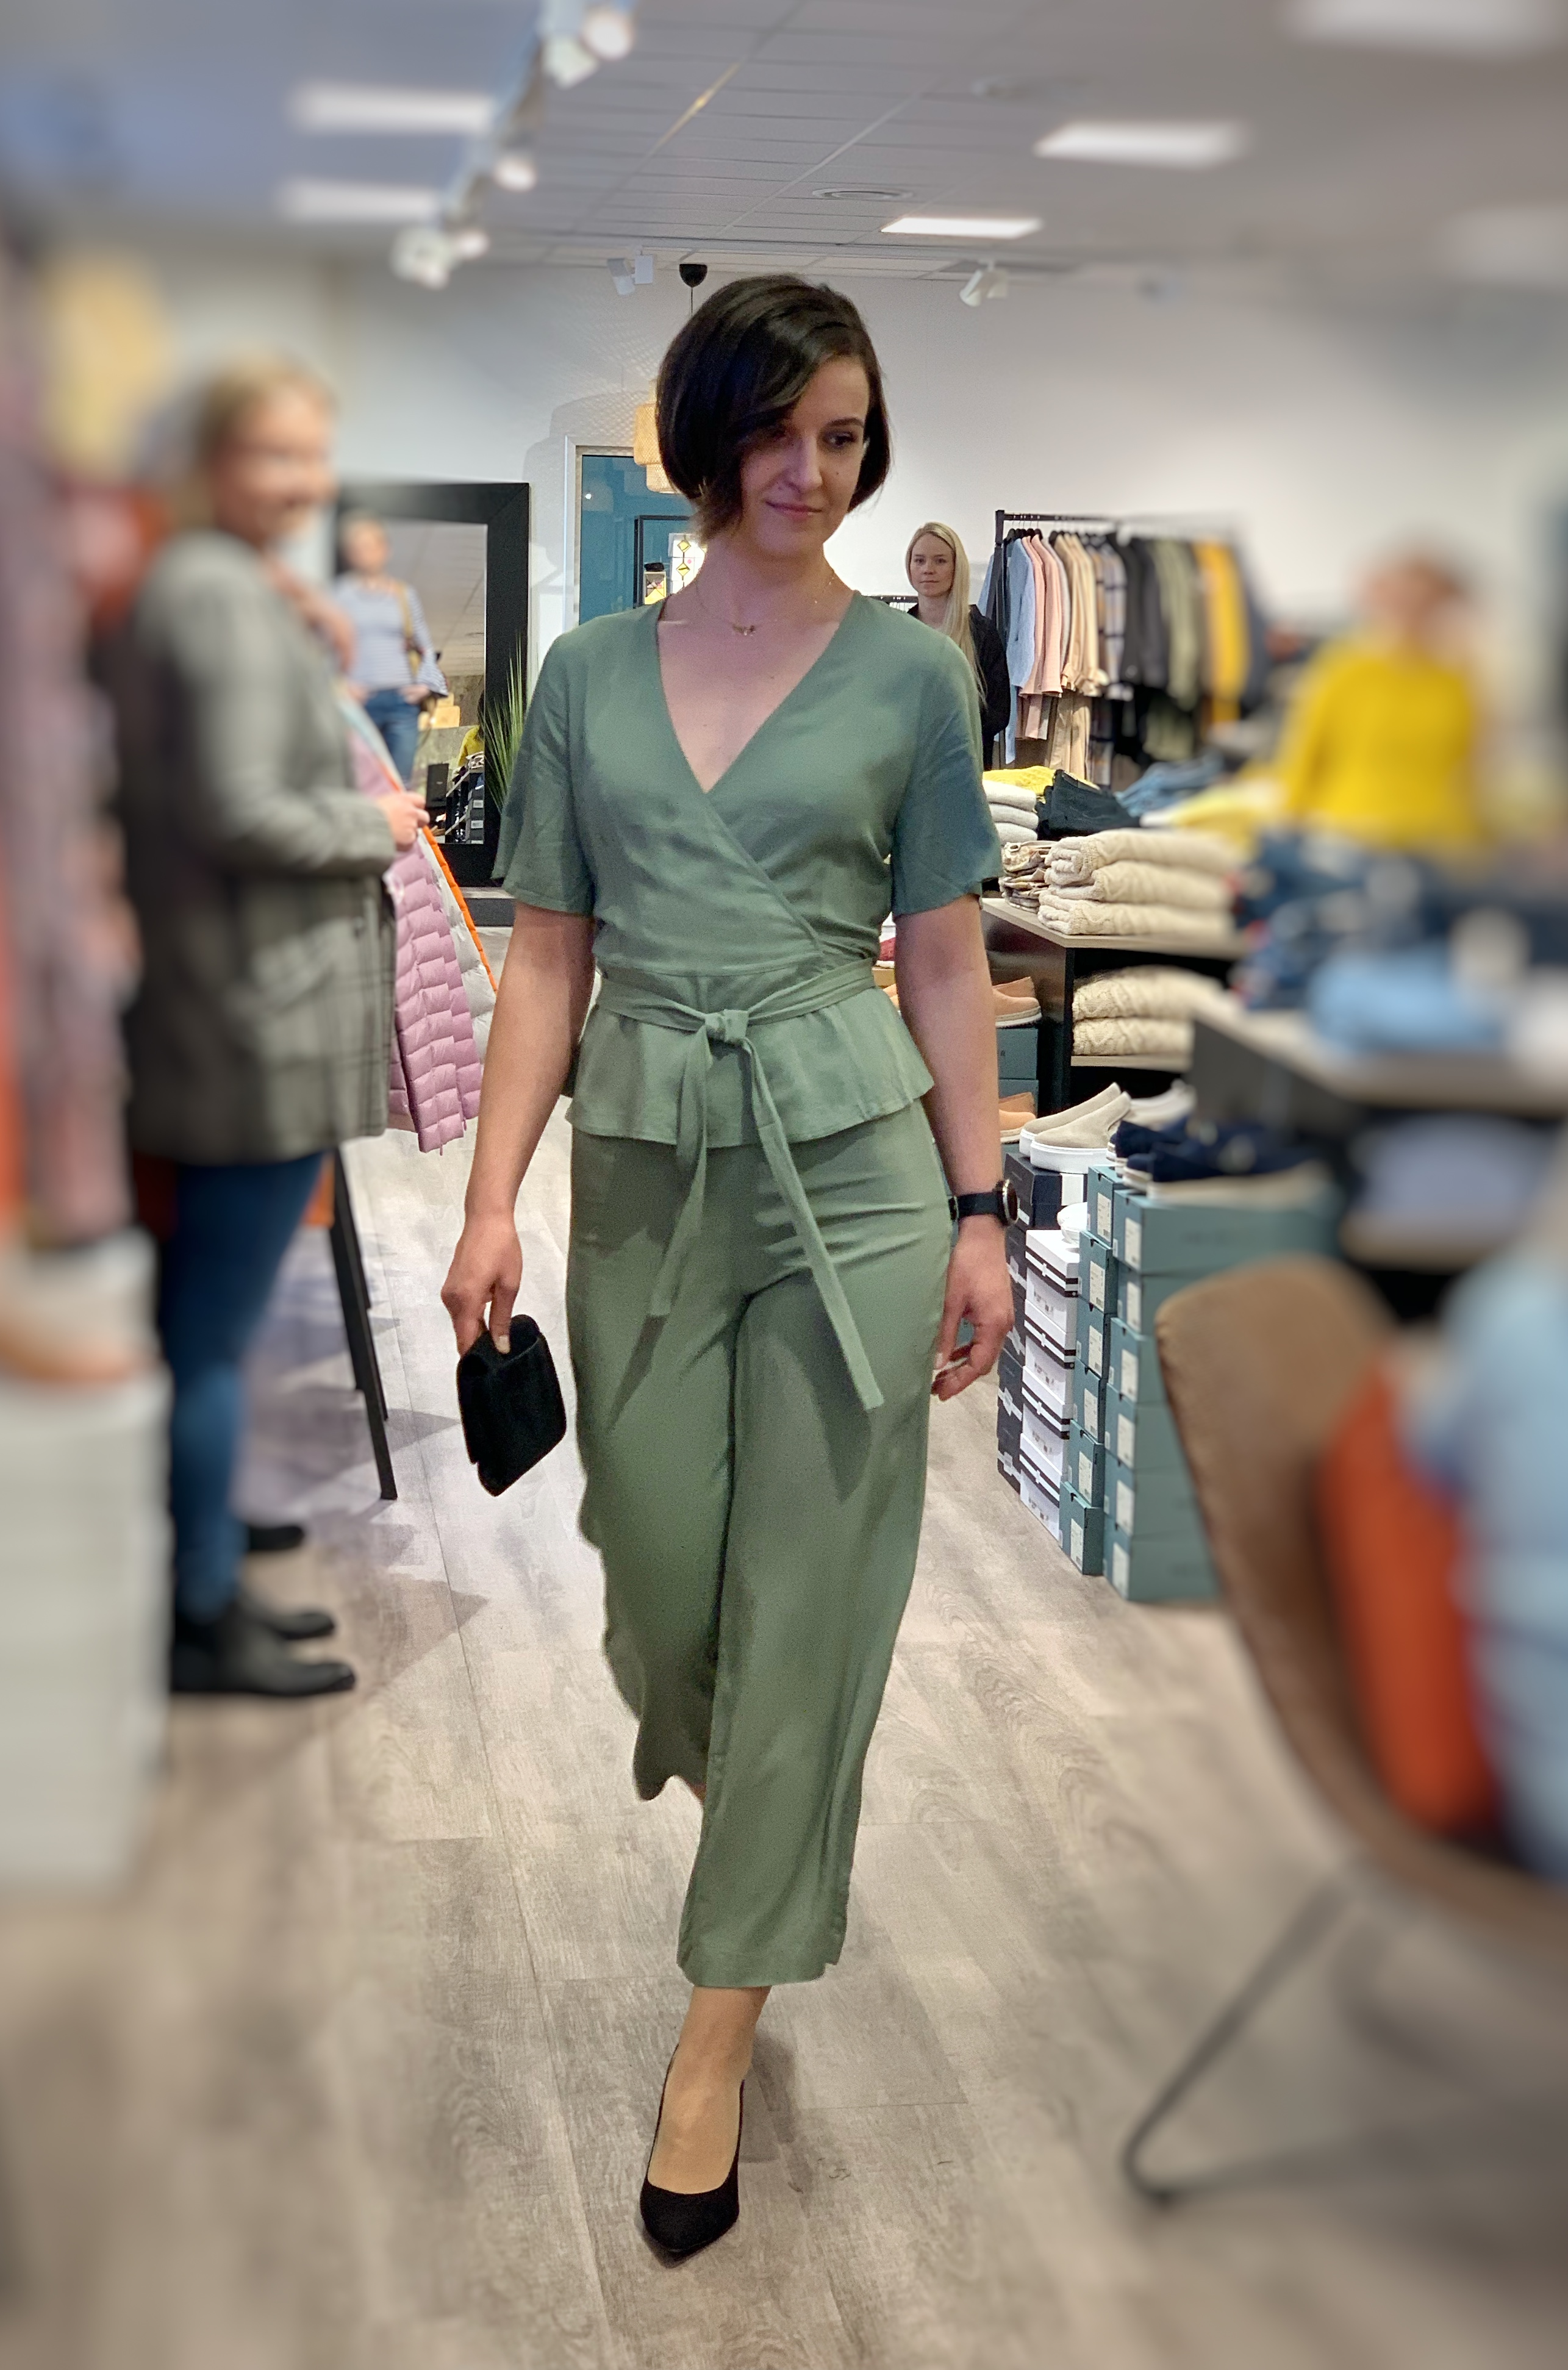 2d534762a CAMILLA PIHL - Fancy Trousers - Feel Good Store